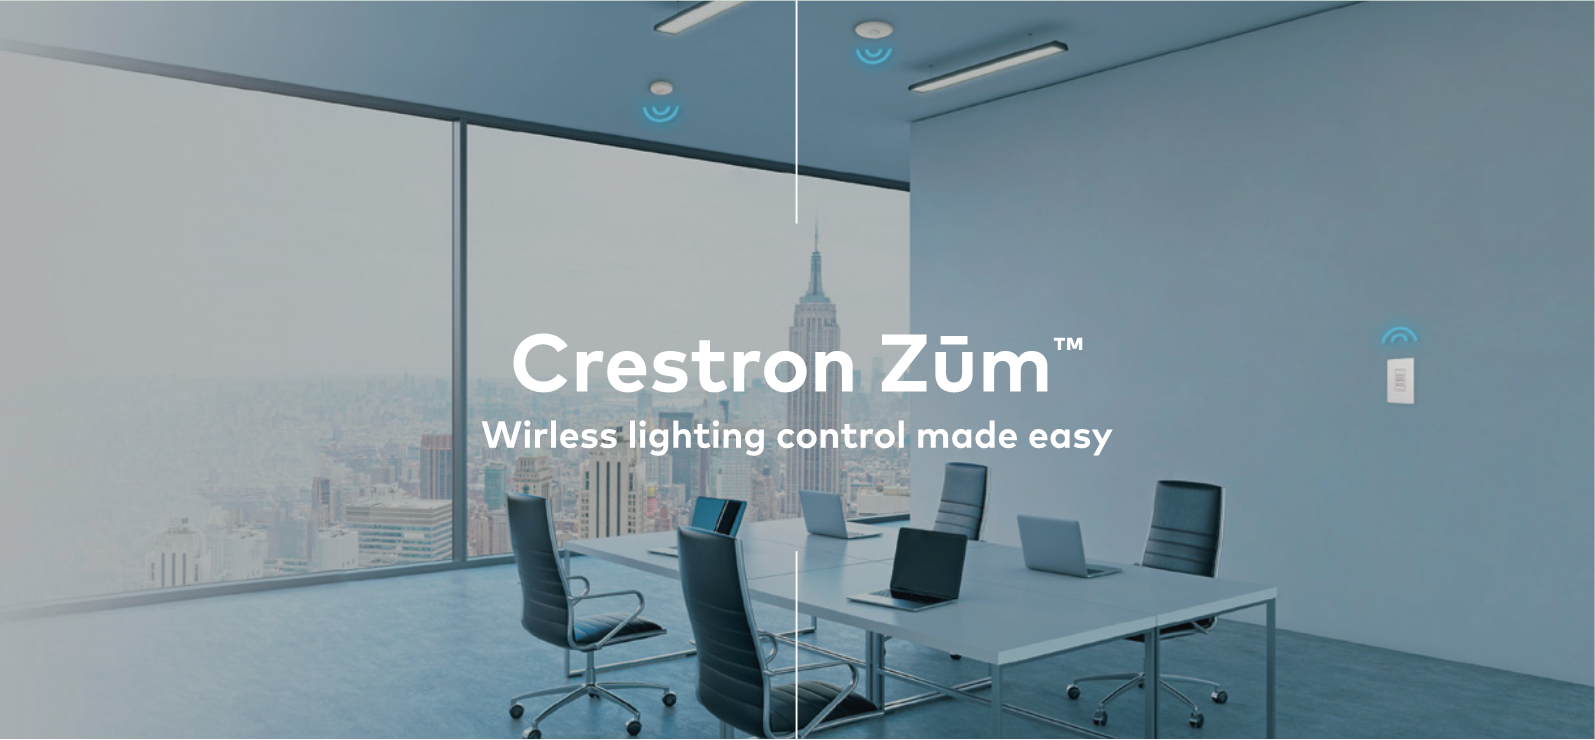 Crestron actualiza Zūm, control inalámbrico de iluminación